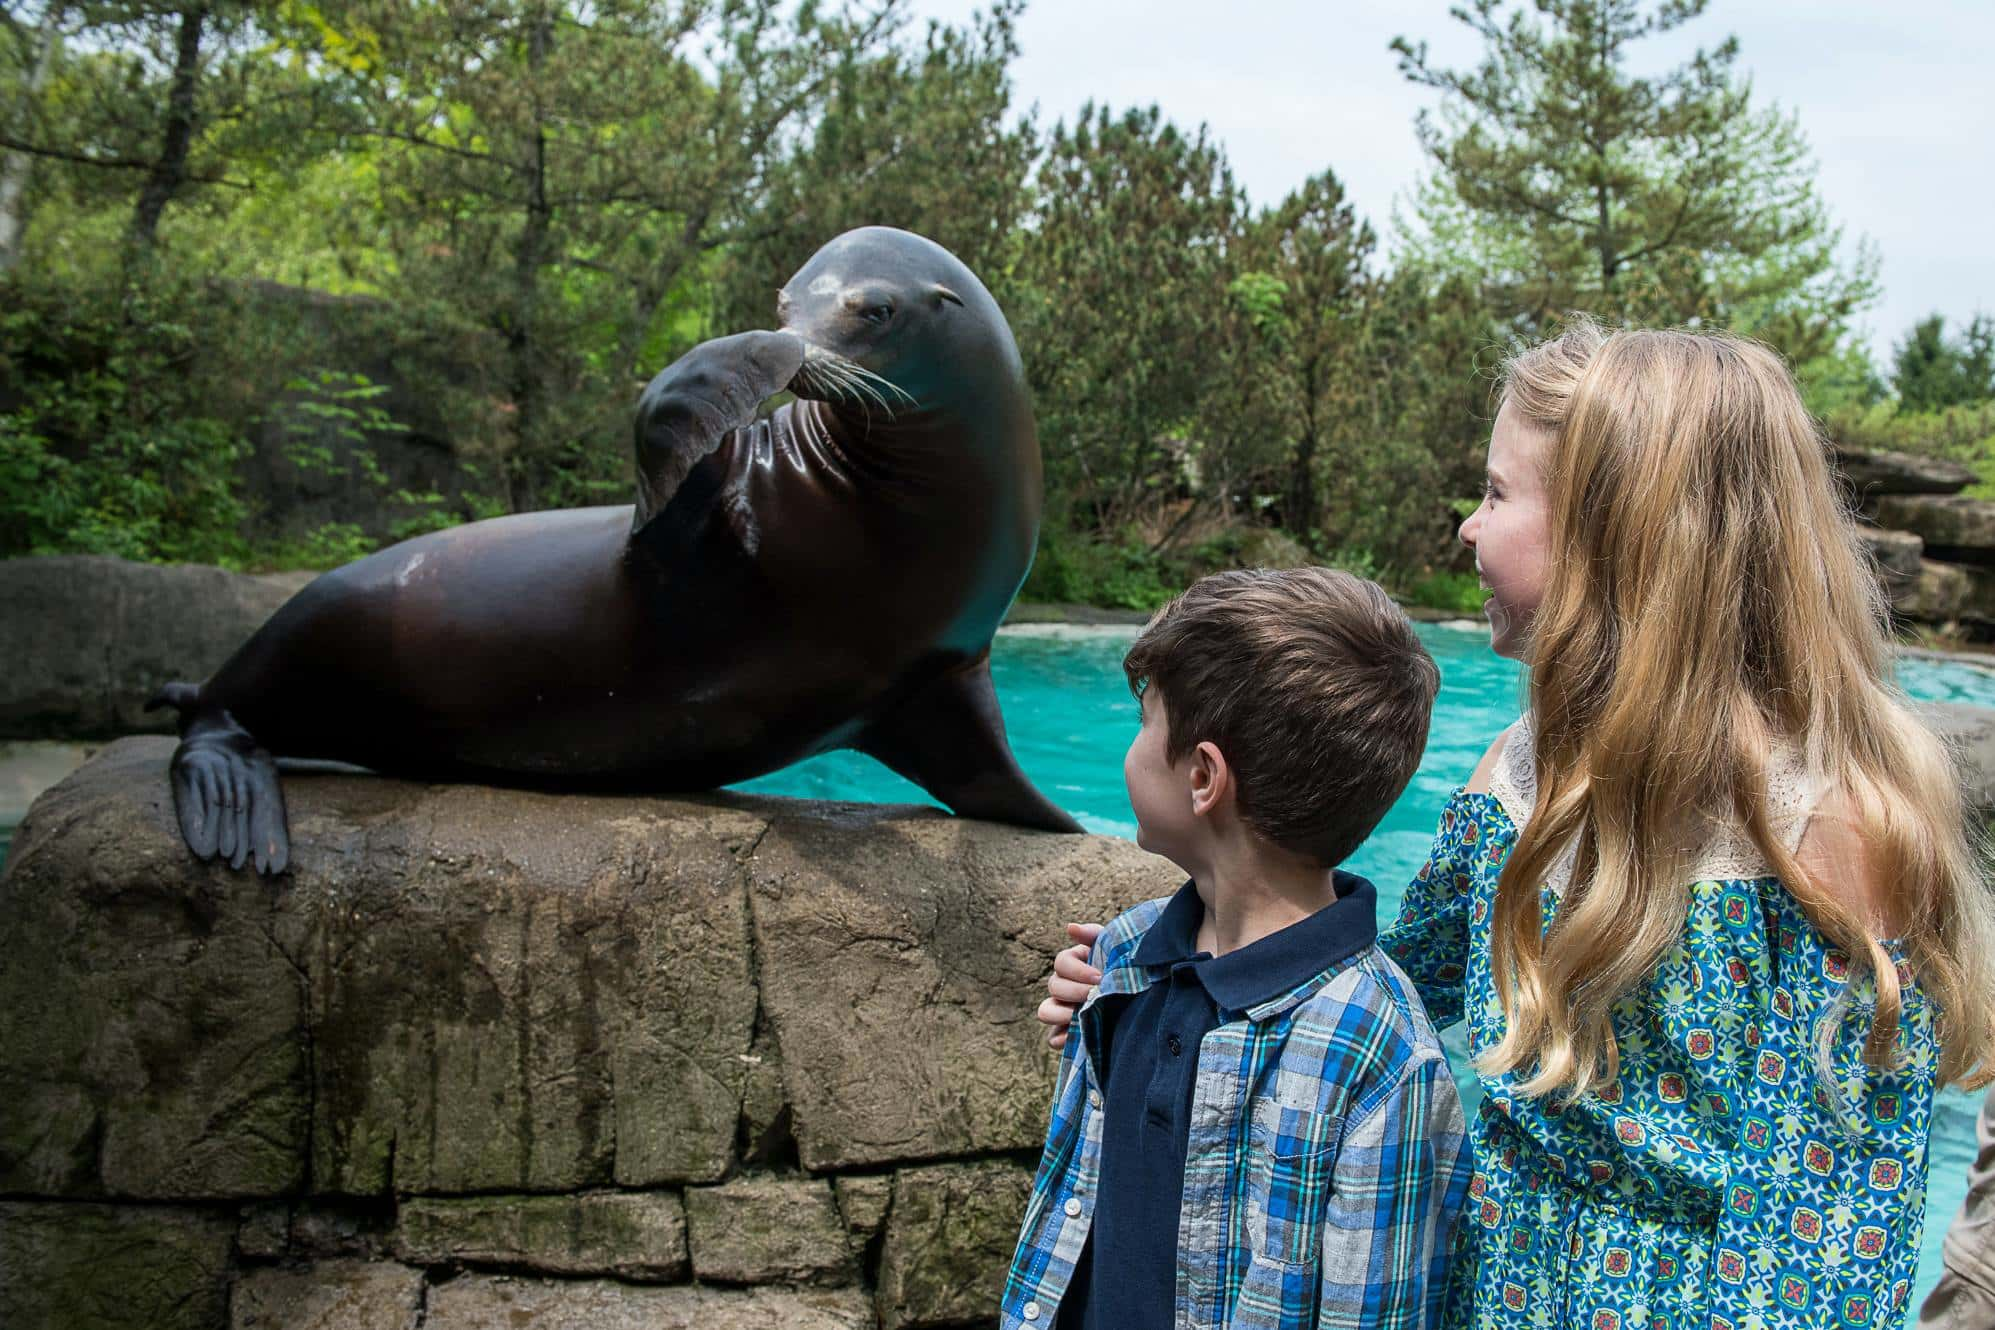 the Pittsburgh Zoo